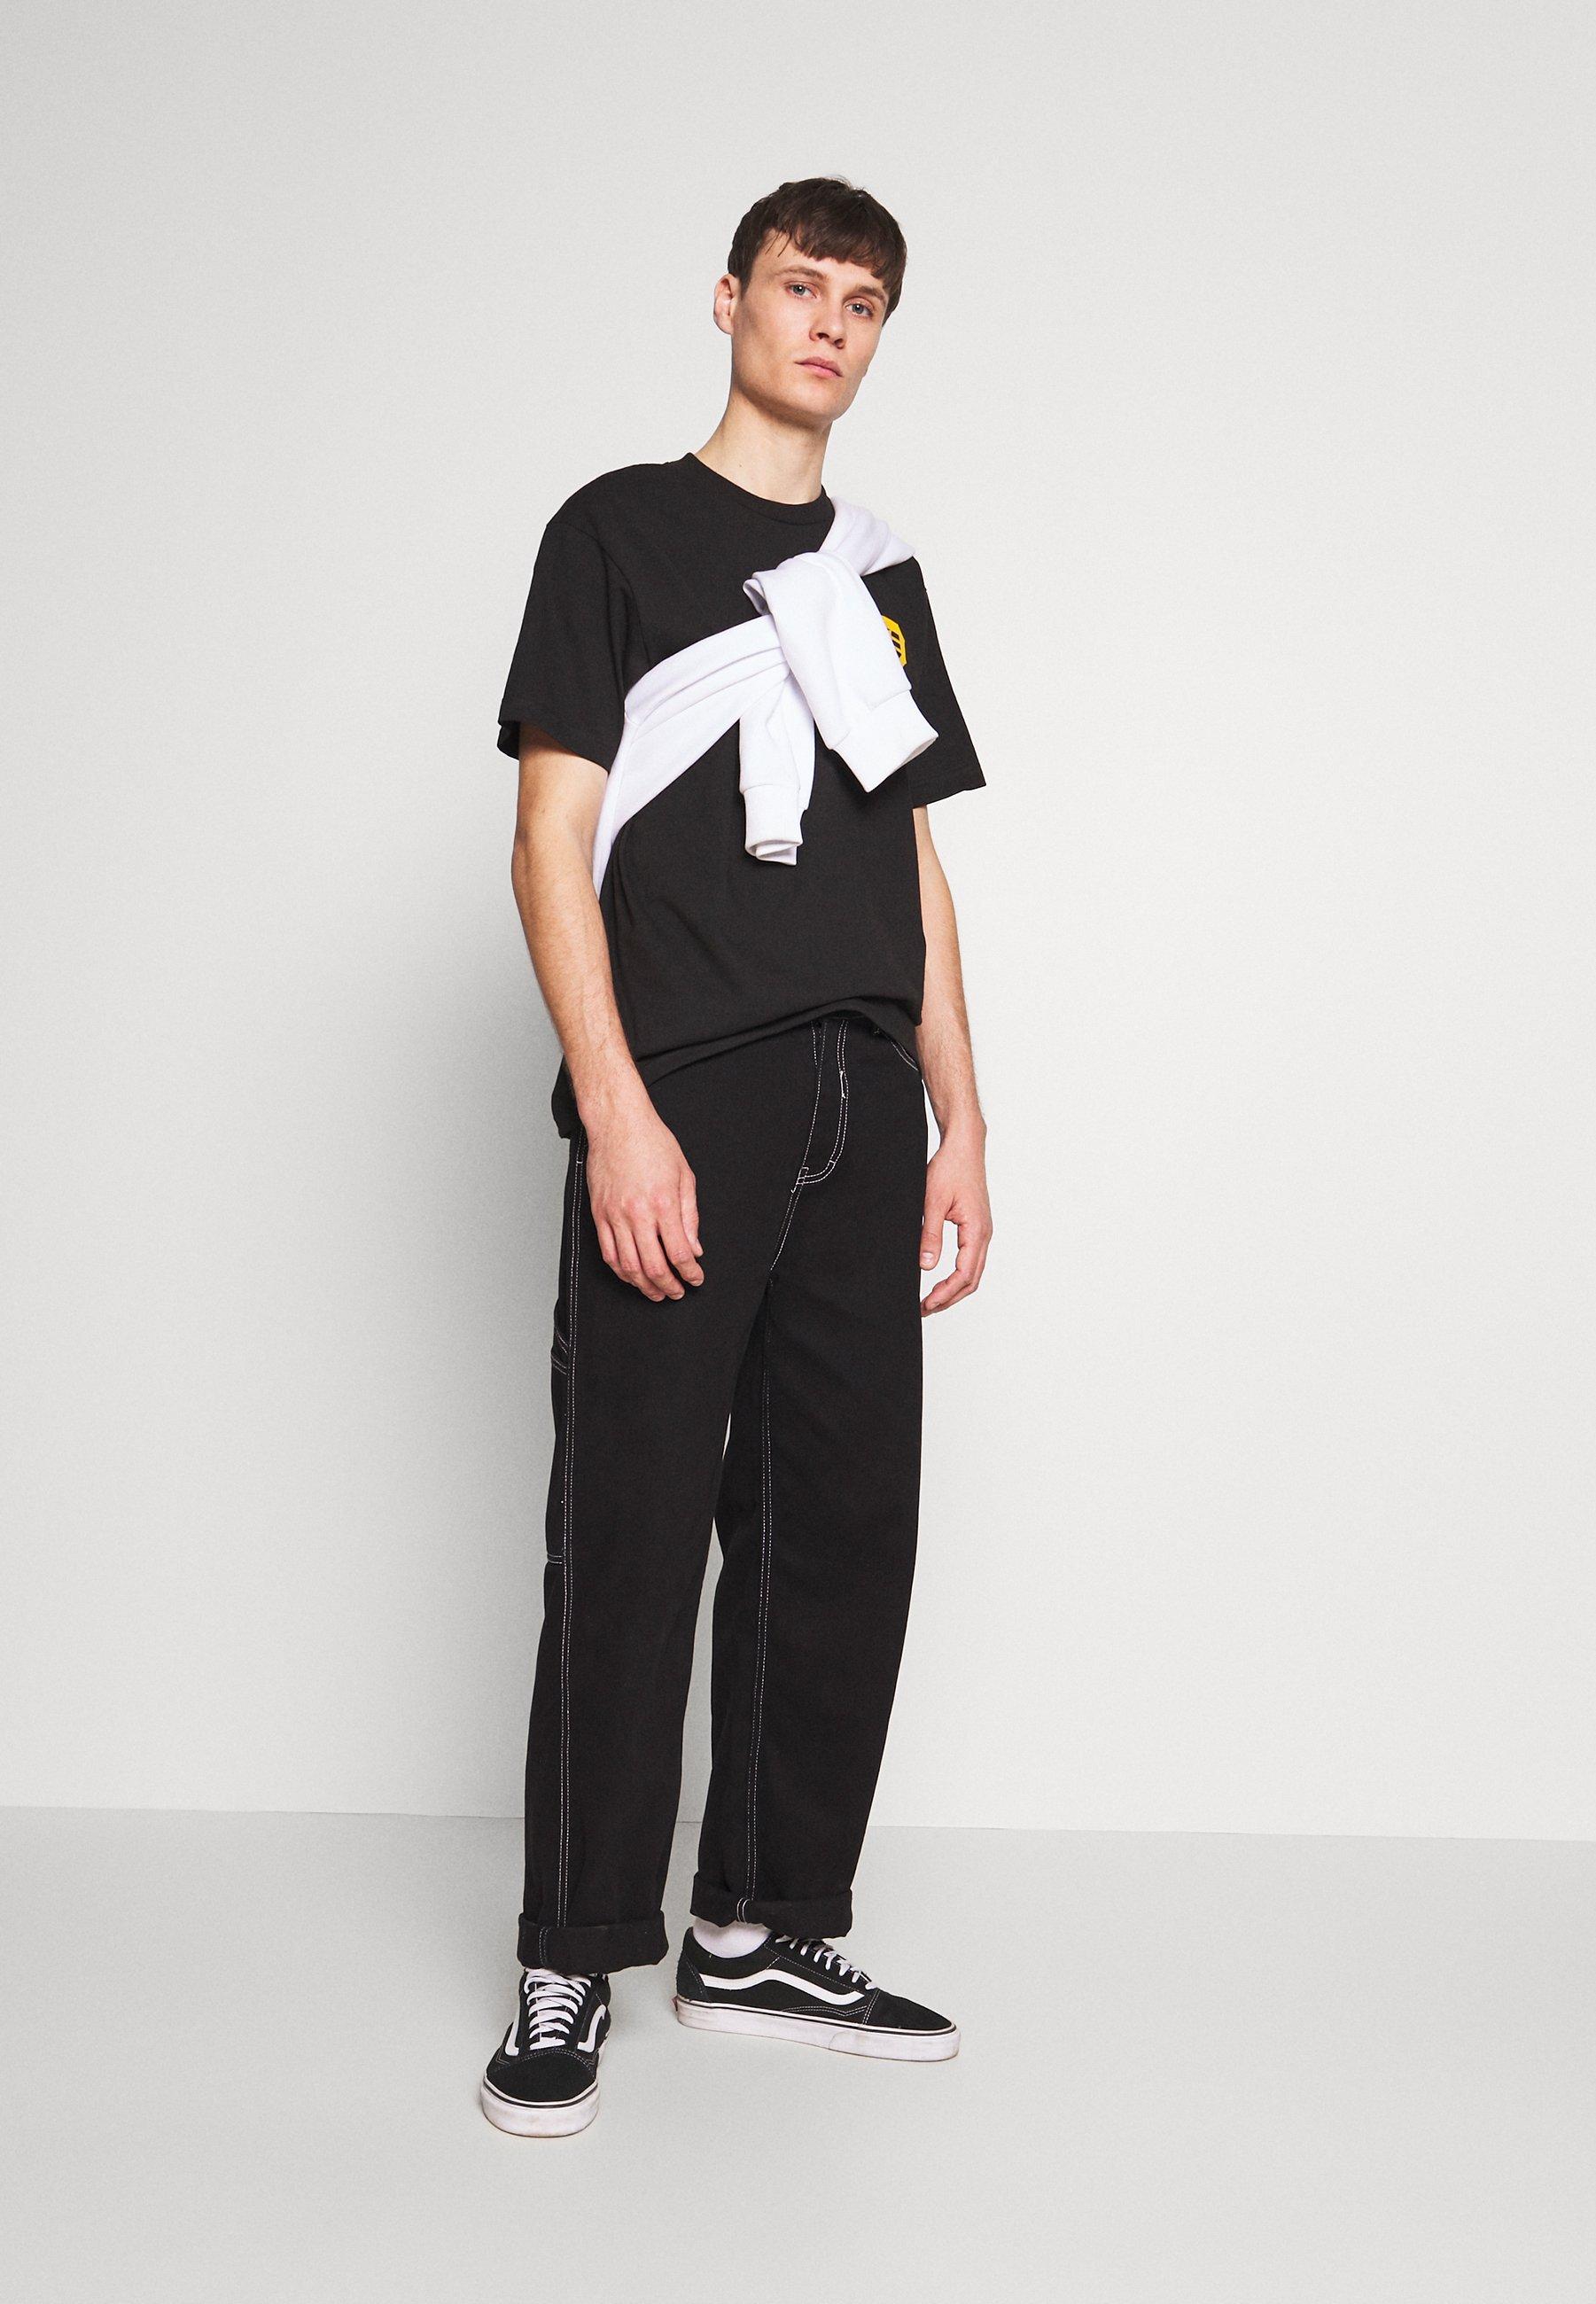 TRUNKS GLOW DRAGON BALL Z T shirt imprimé black